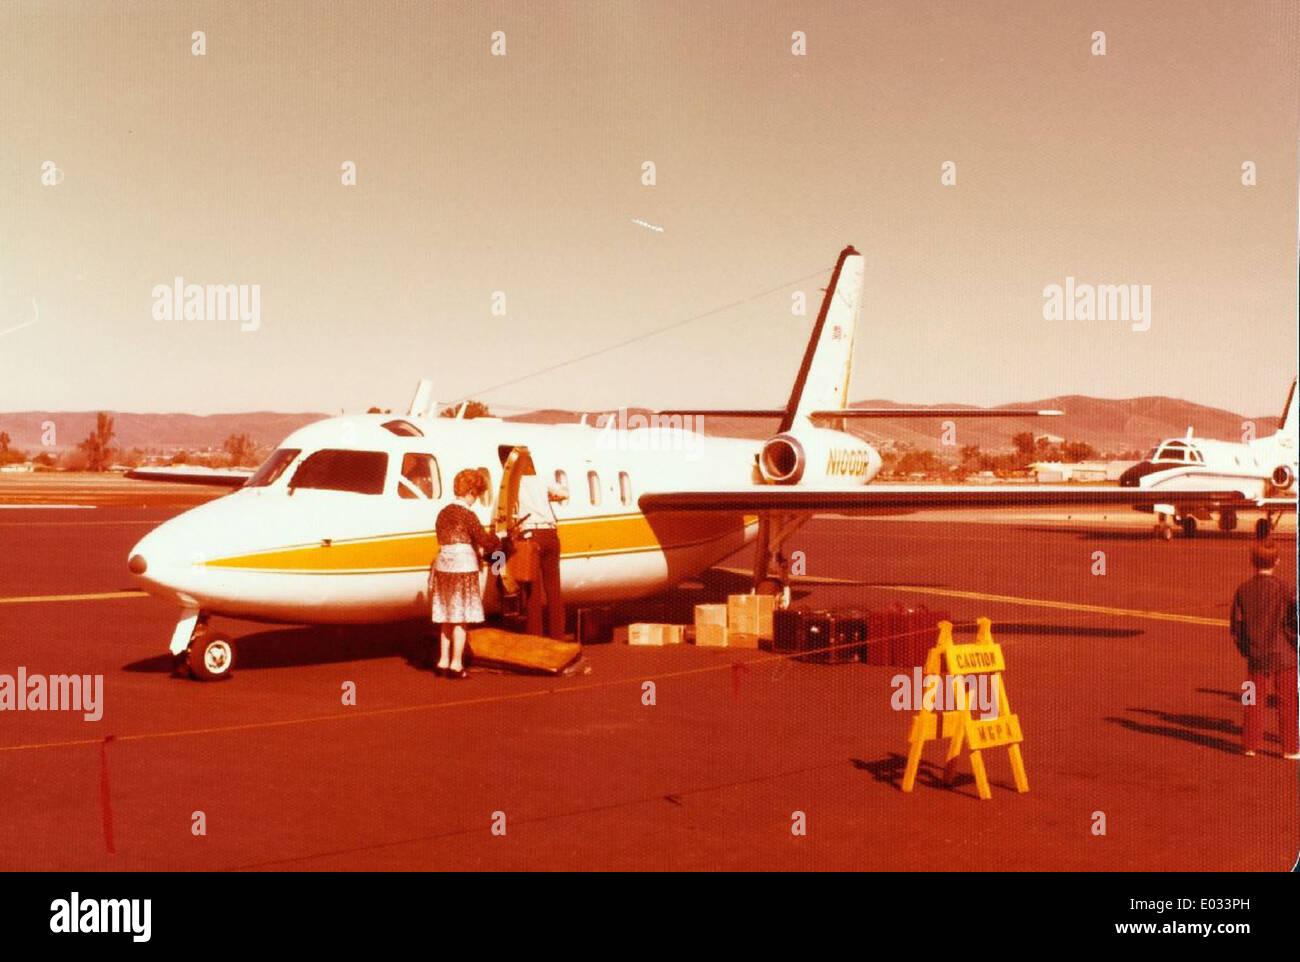 Aero Commander, 1121, Jet Commander